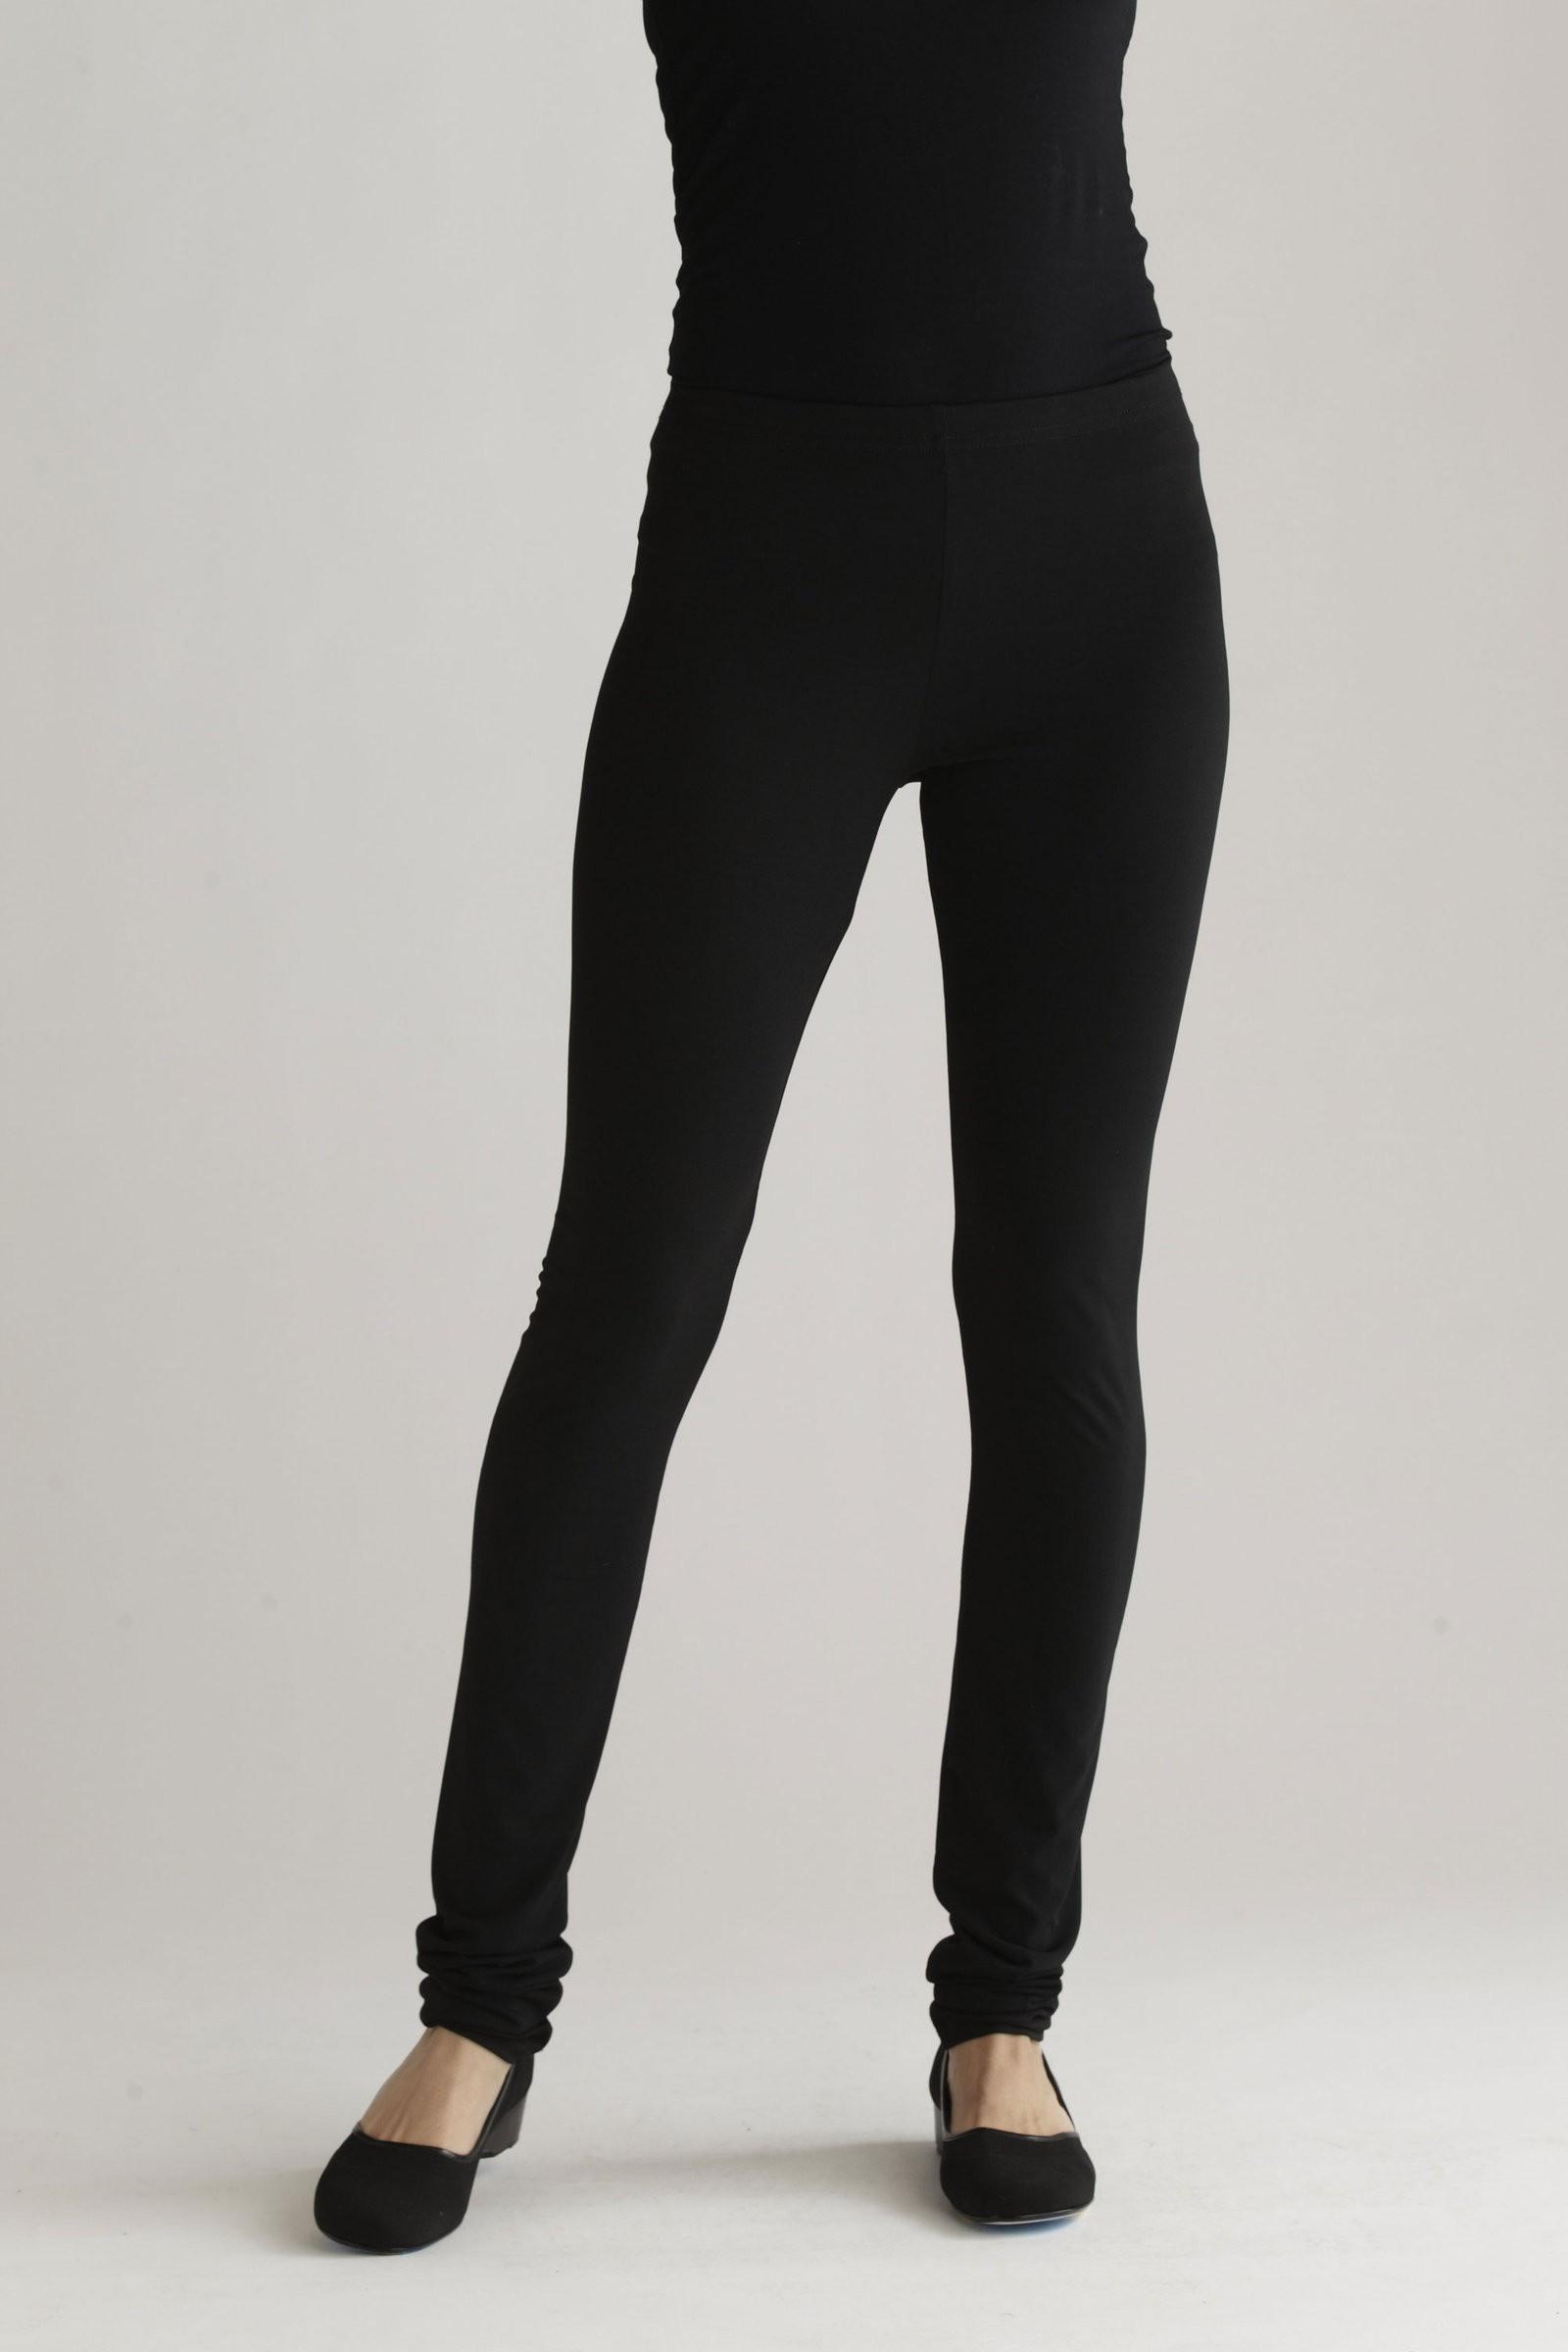 Black Elasto Leggings